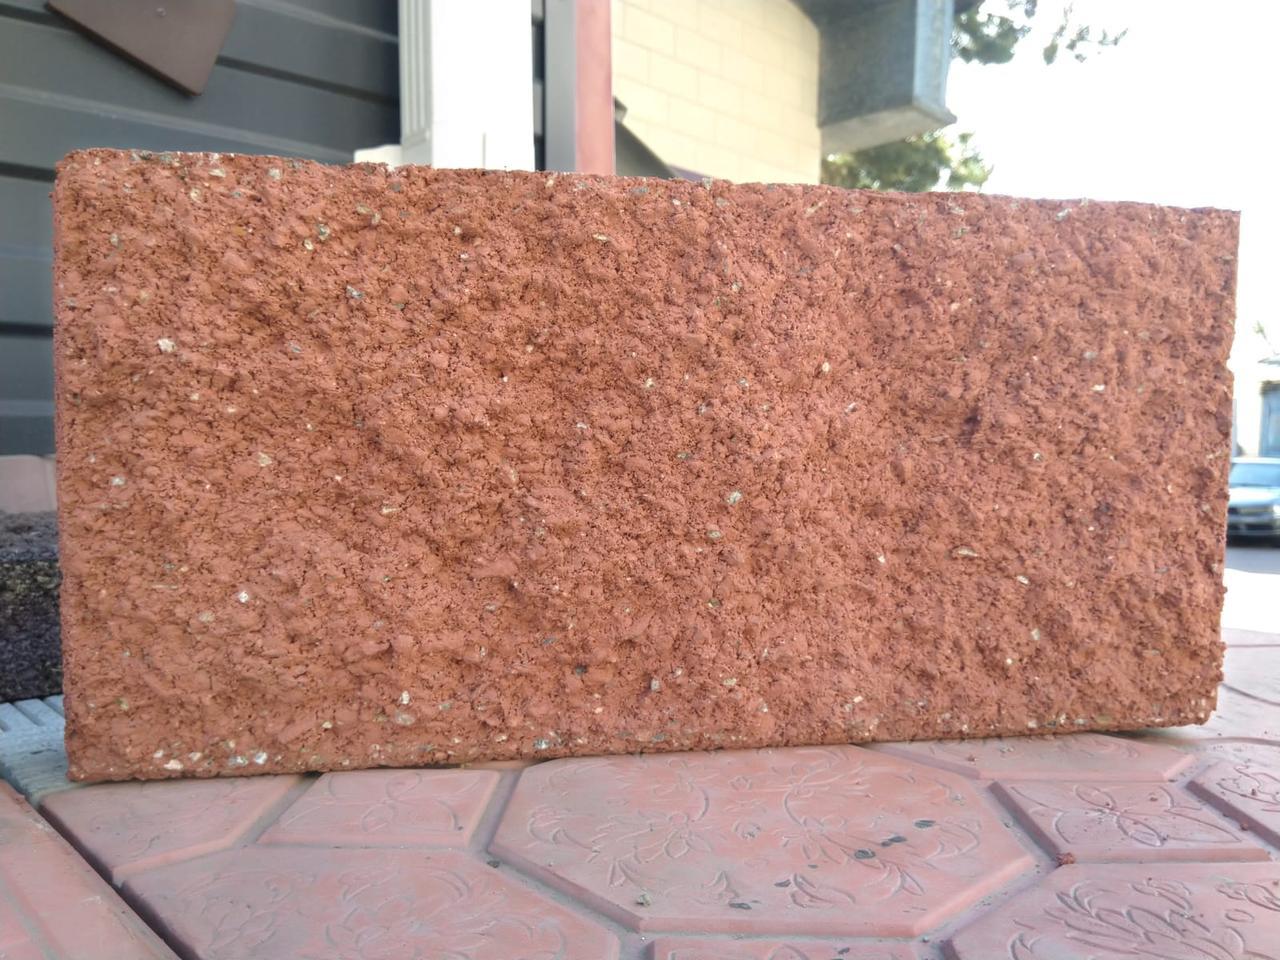 Плитка рваная 390х190х60 мм Красный вибролитая